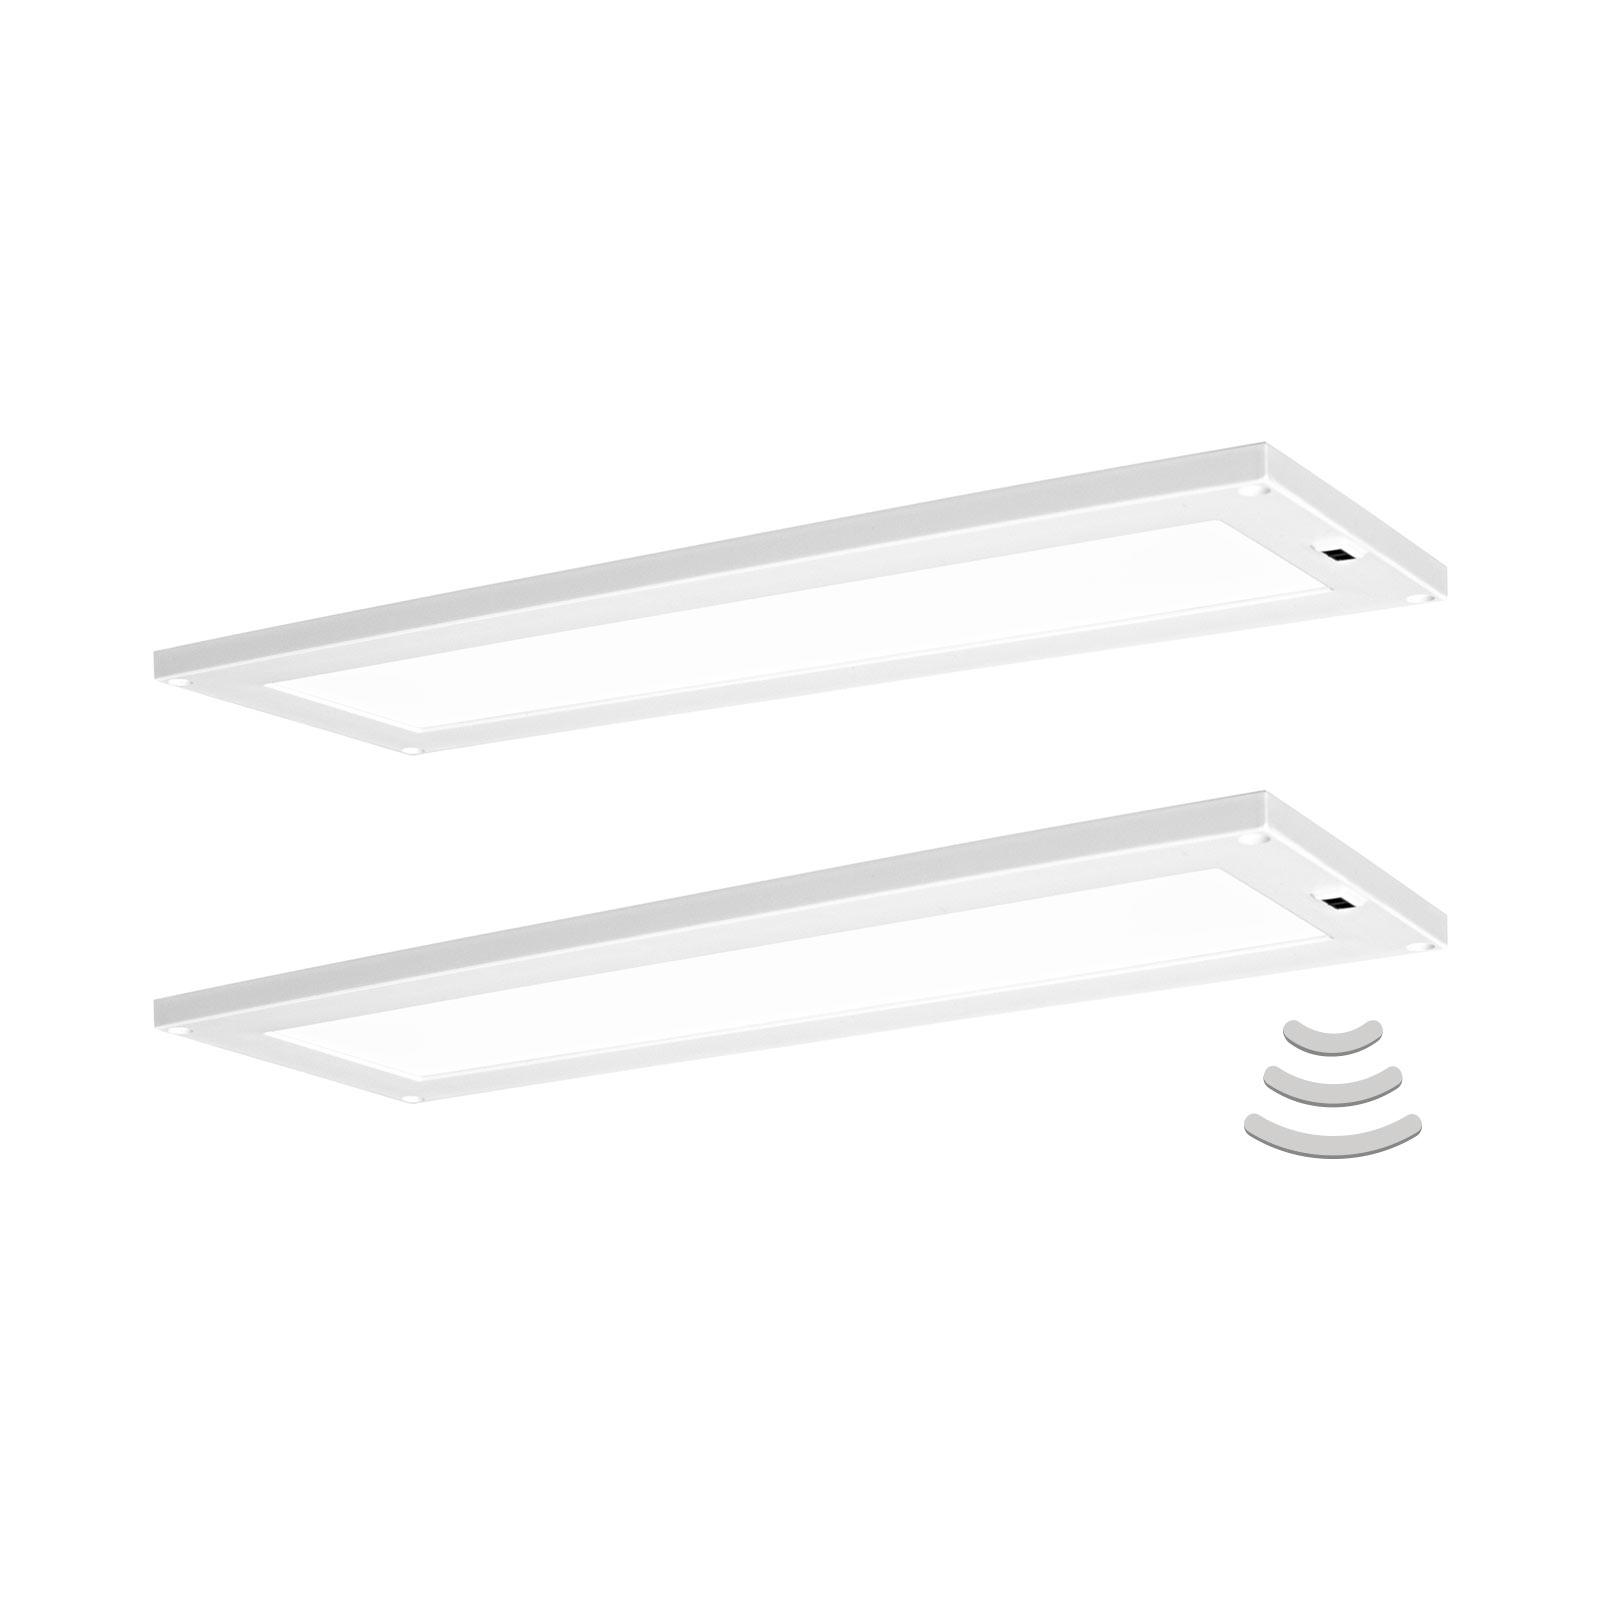 LEDVANCE Cabinet Panel -kaapinalusvalo 30x10cm x2